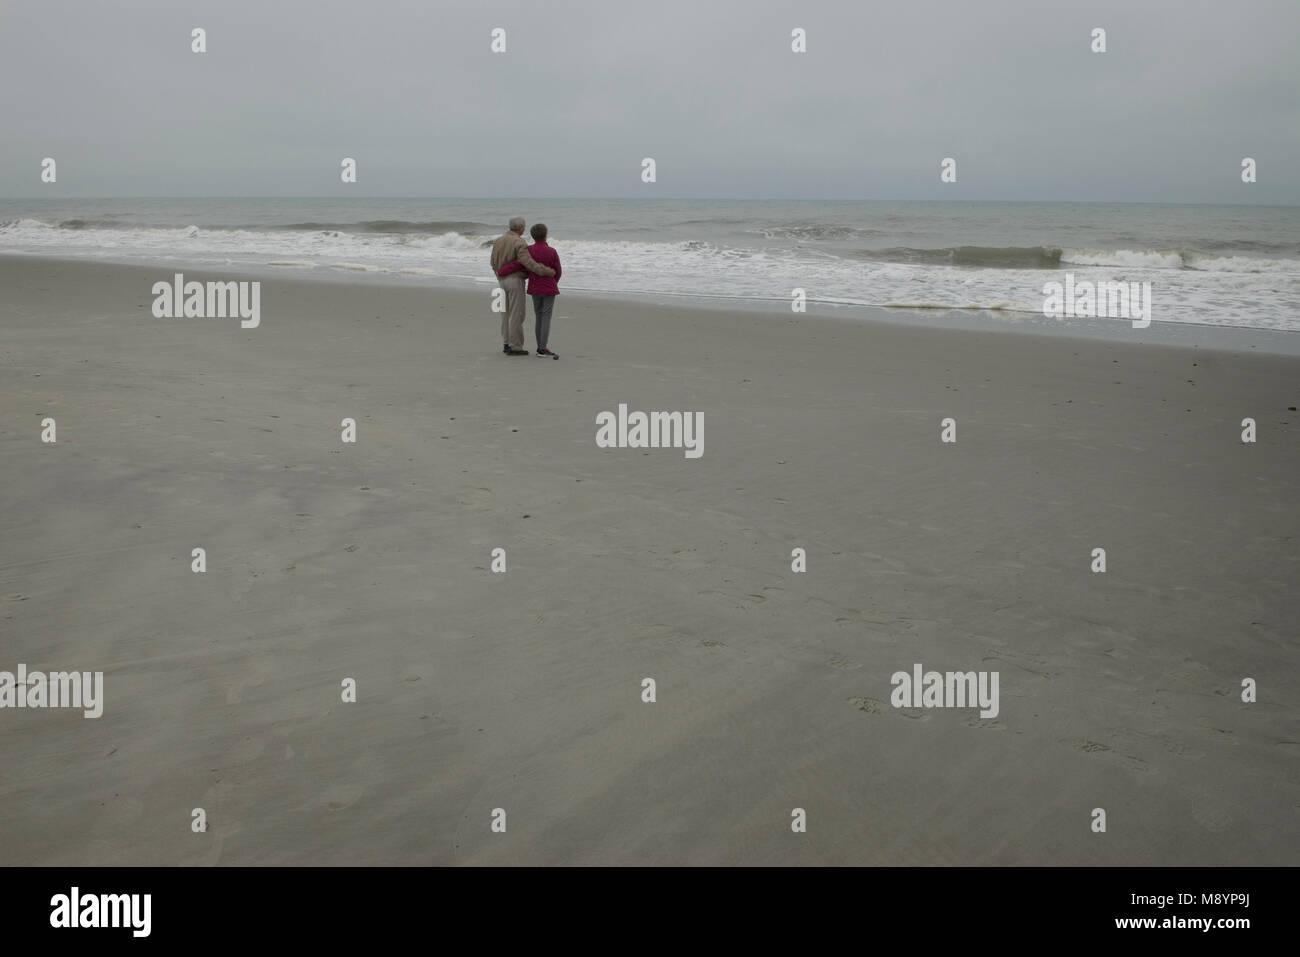 Senior couple views ocean at Myrtle Beach, South Carolina, USA. - Stock Image